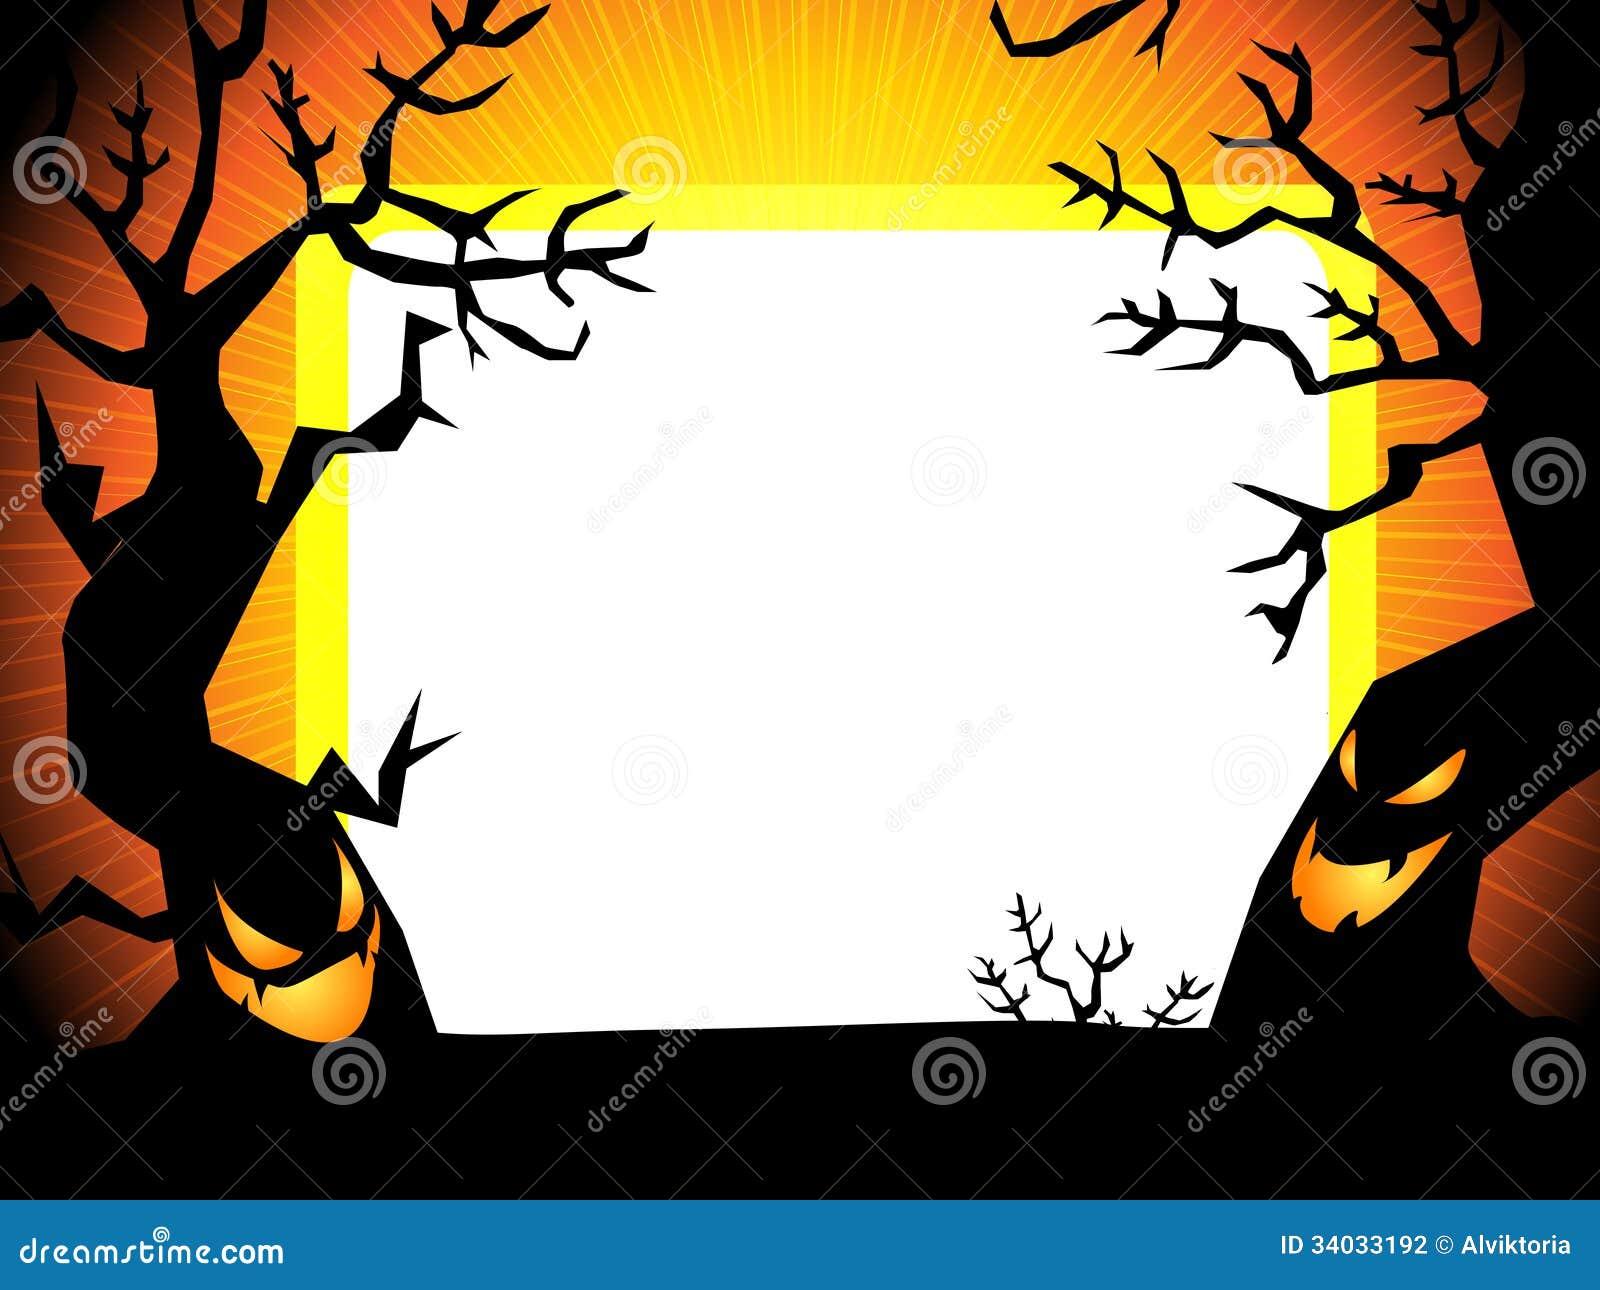 Halloween Achtergrond.Halloween Achtergrond Stock Illustratie Illustration Of Kasteel 34033192